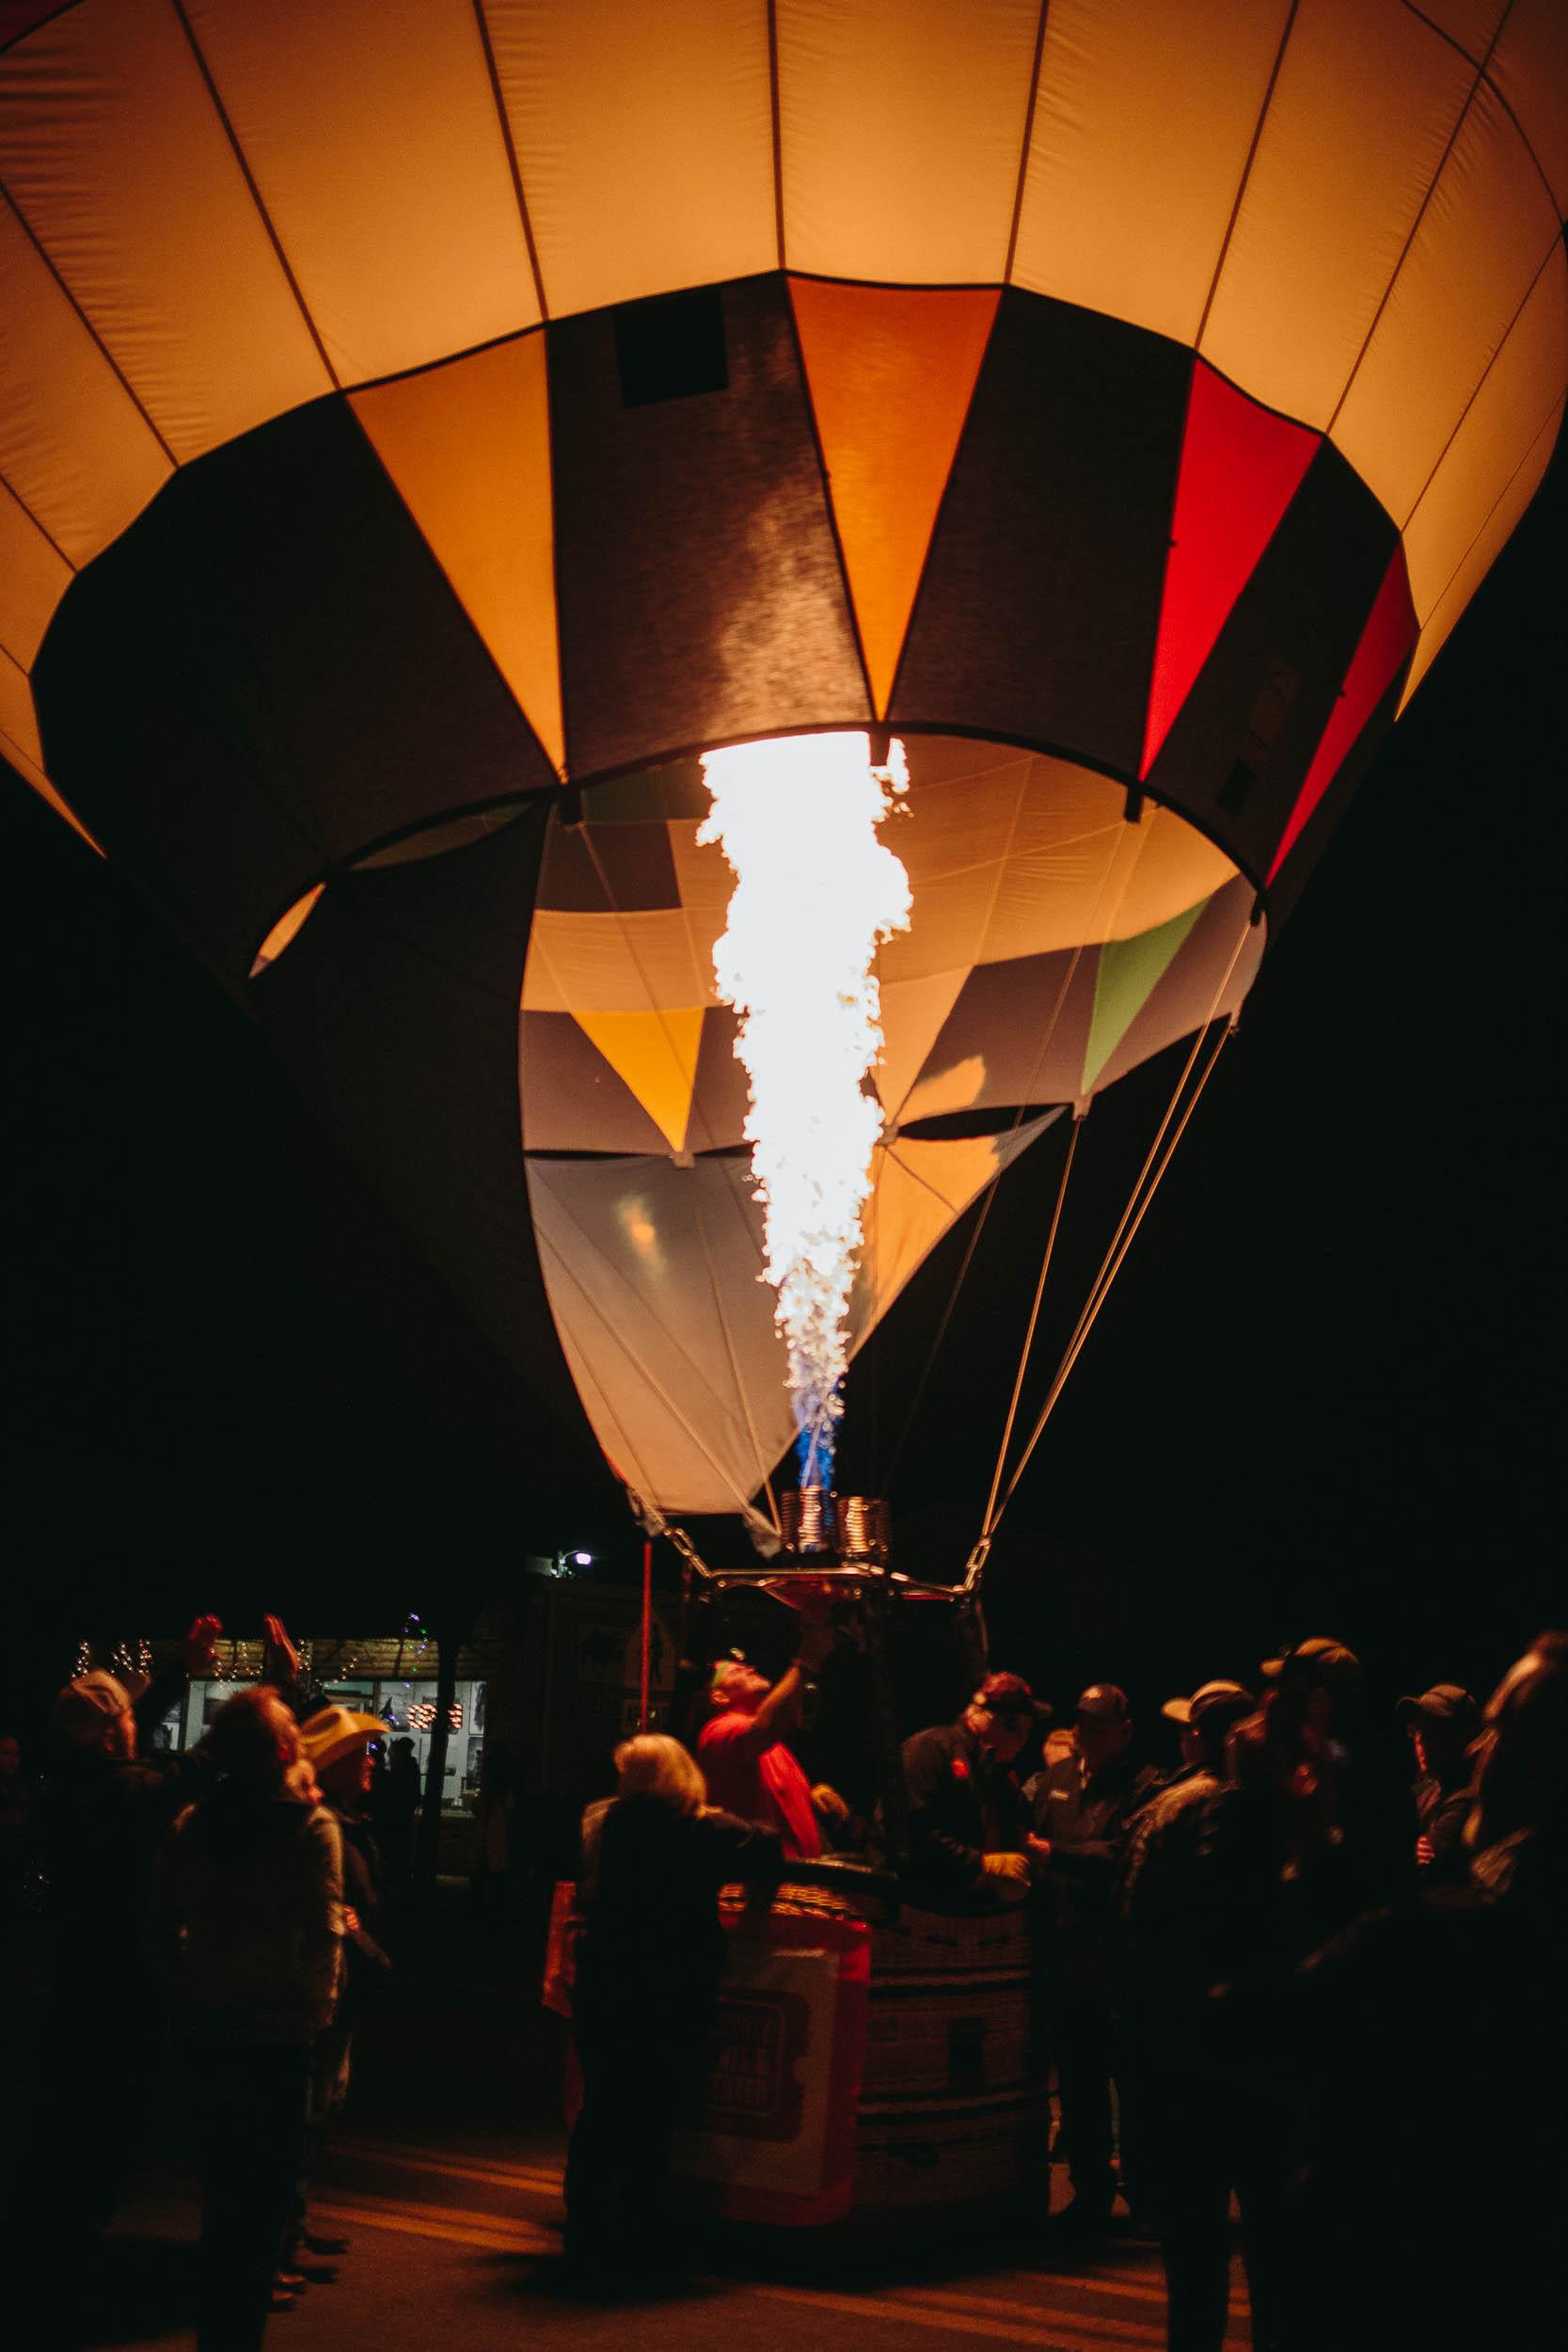 Kyle-Sheppard-Kanab-Balloon-Festival-47.jpg